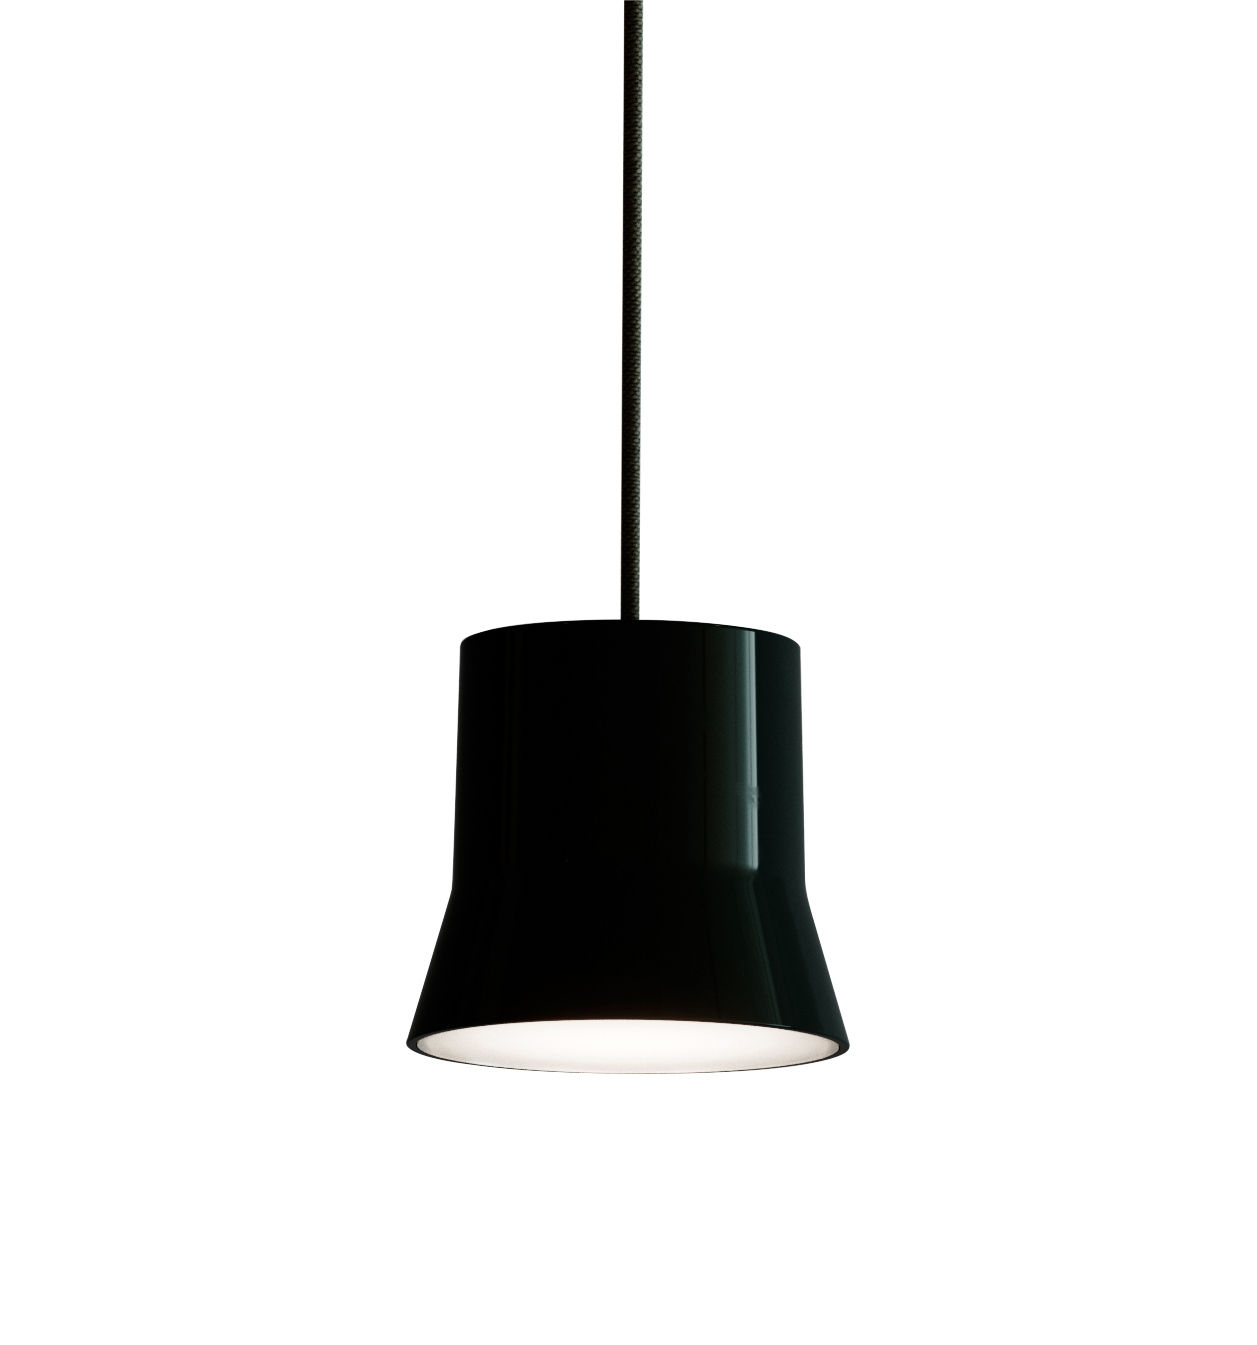 Lighting - Pendant Lighting - Gio Light Pendant - / LED - Ø 10.7 cm by Artemide - Black / Black cable - Aluminium, Glass